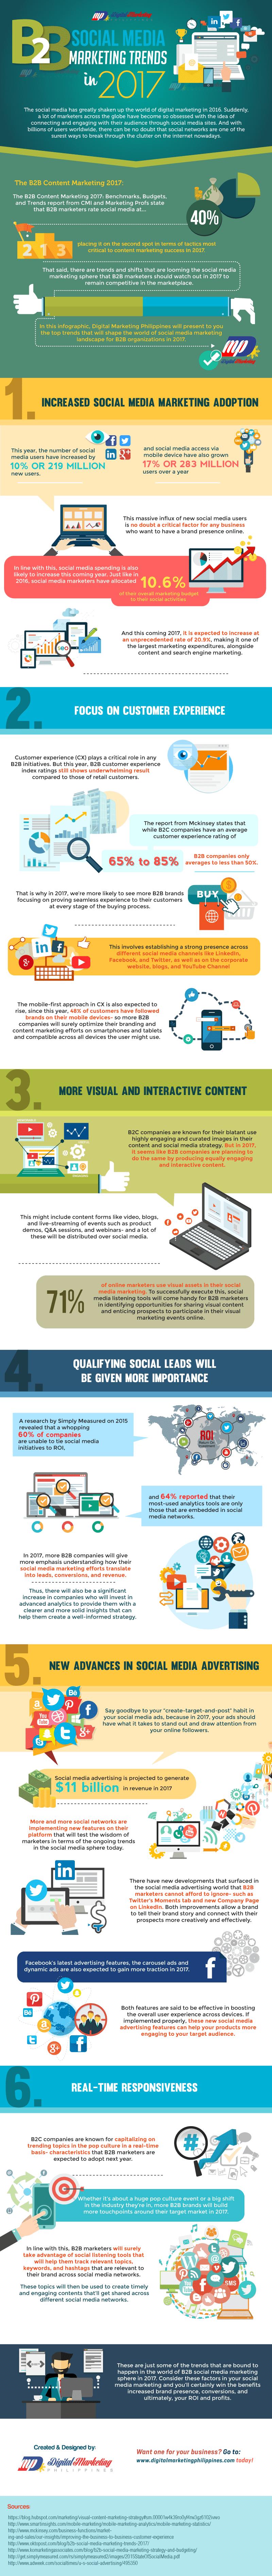 B2B-6-tendances-marketing-sur-medias-sociaux